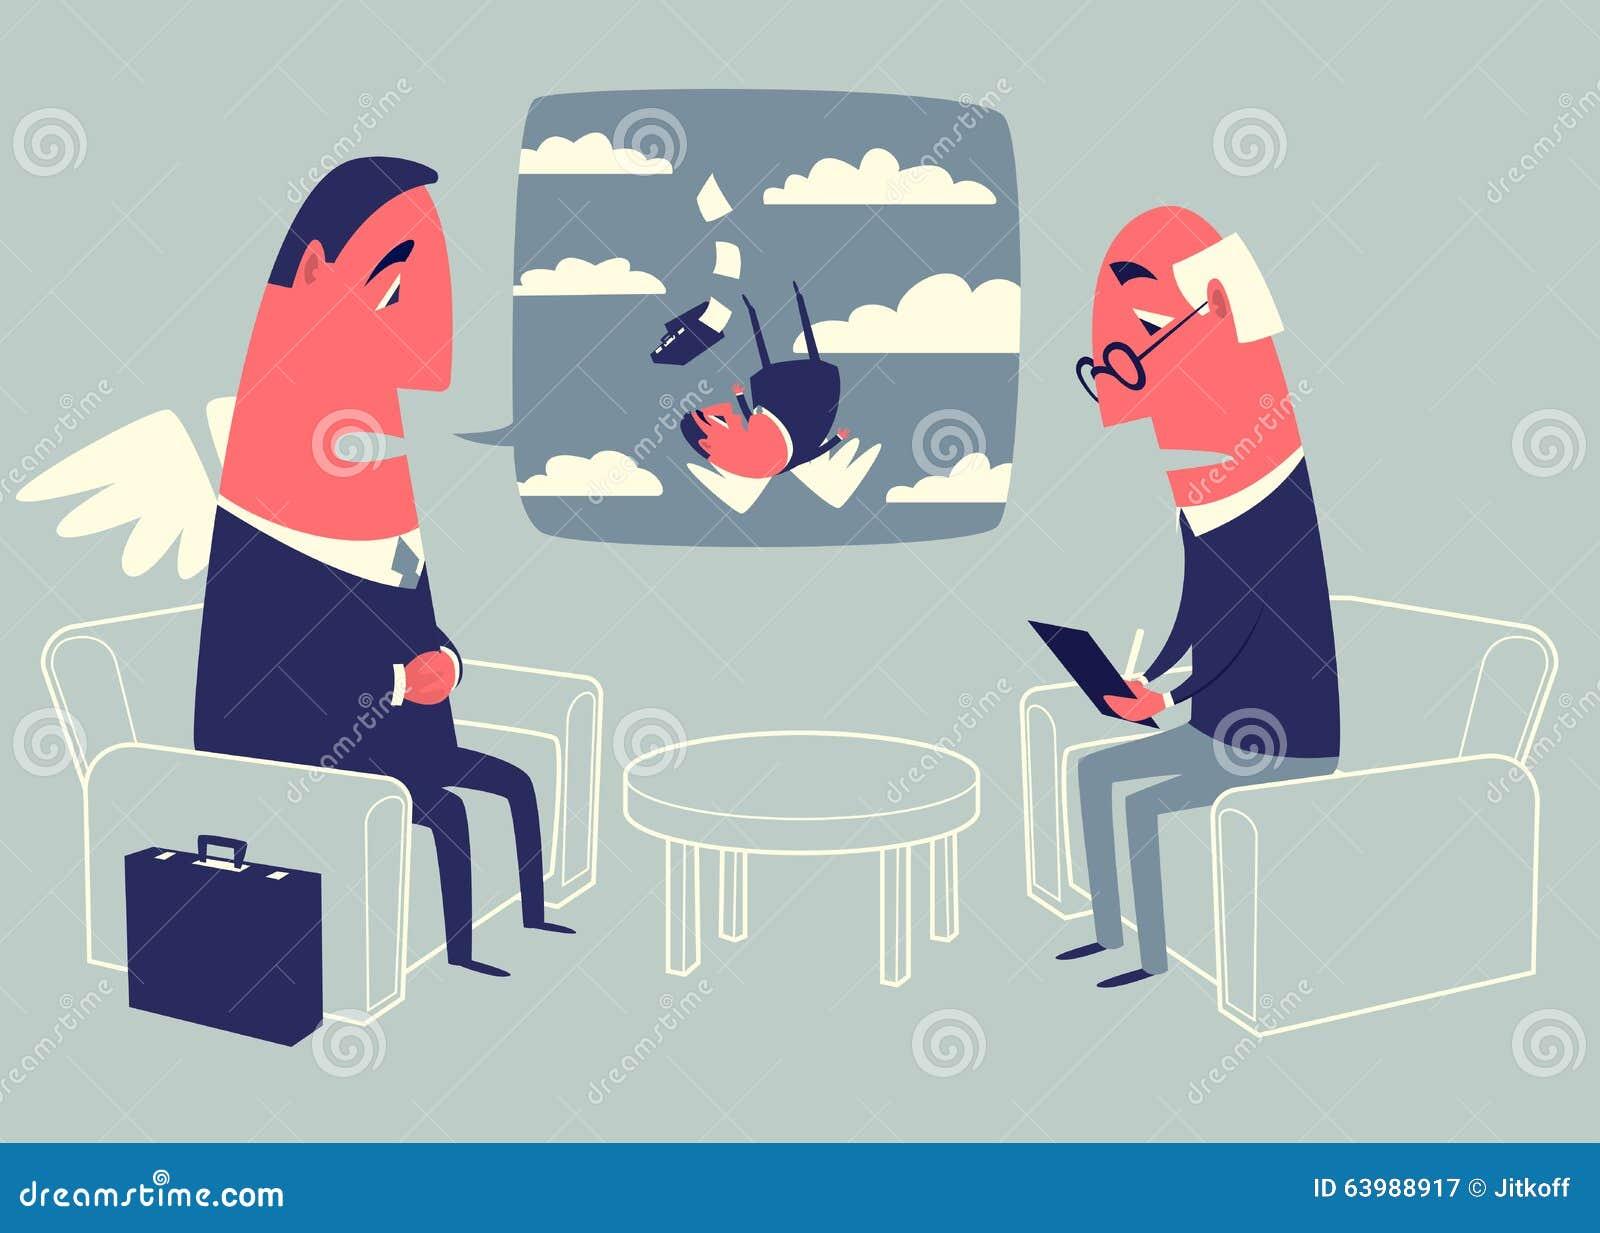 Conversation With A Psychologist Cartoon Vector